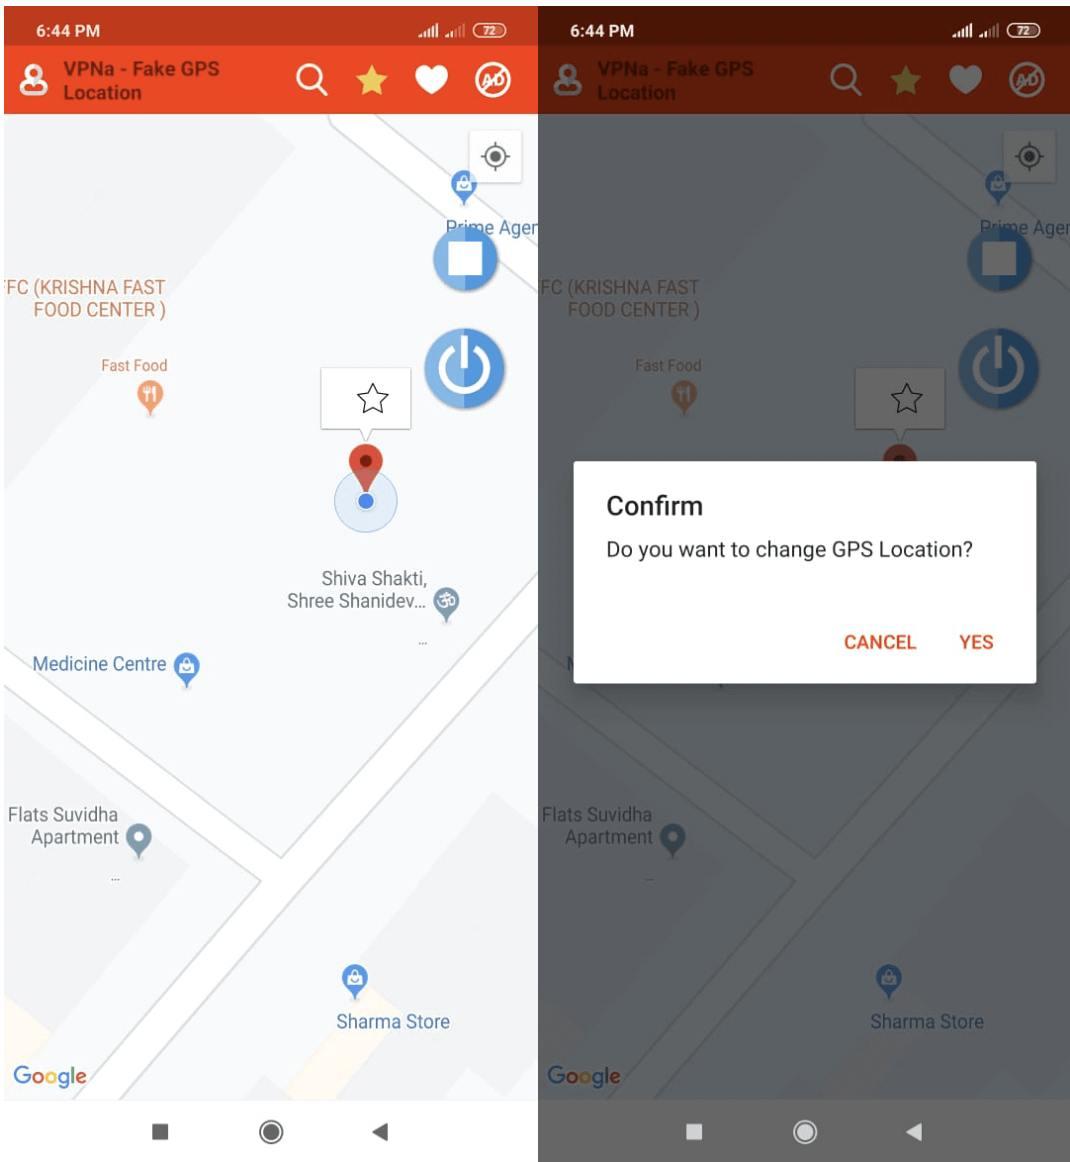 fake gps mit vpn app